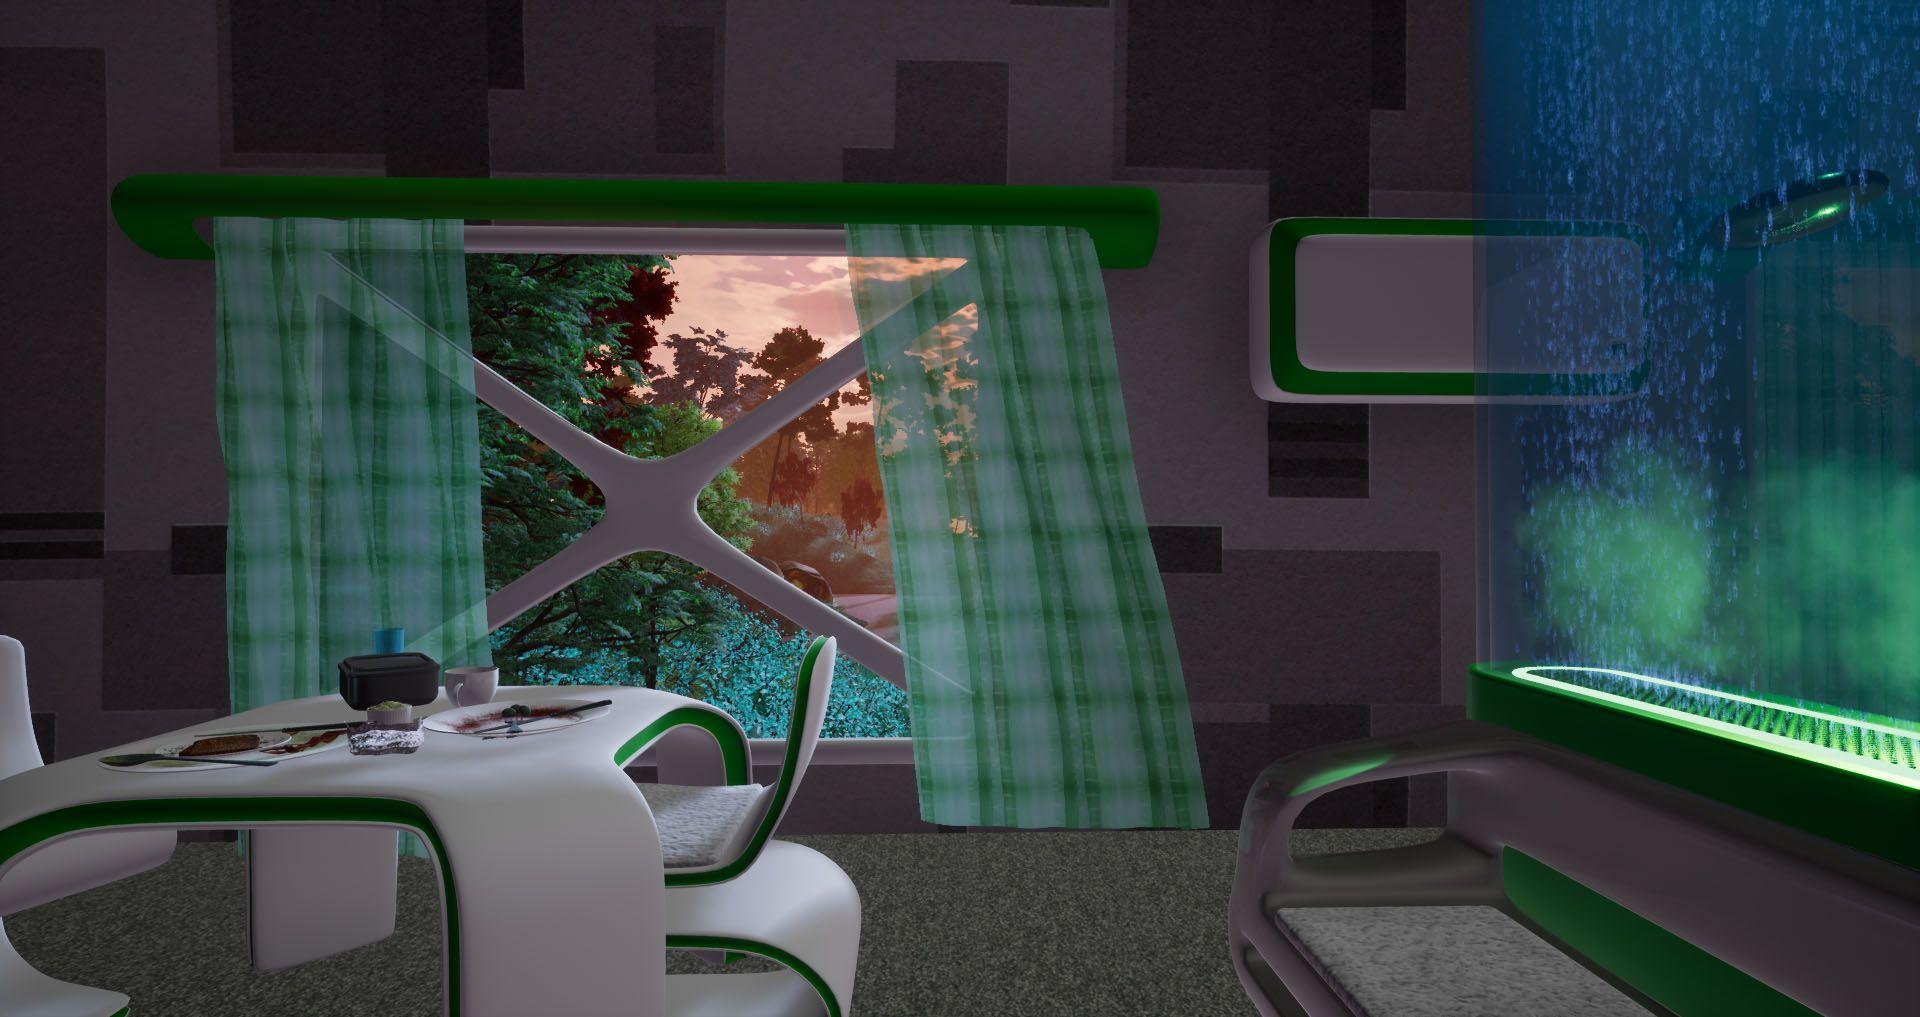 Unreal Engine 4 0 - Photorealism is here, Trinity - Interior